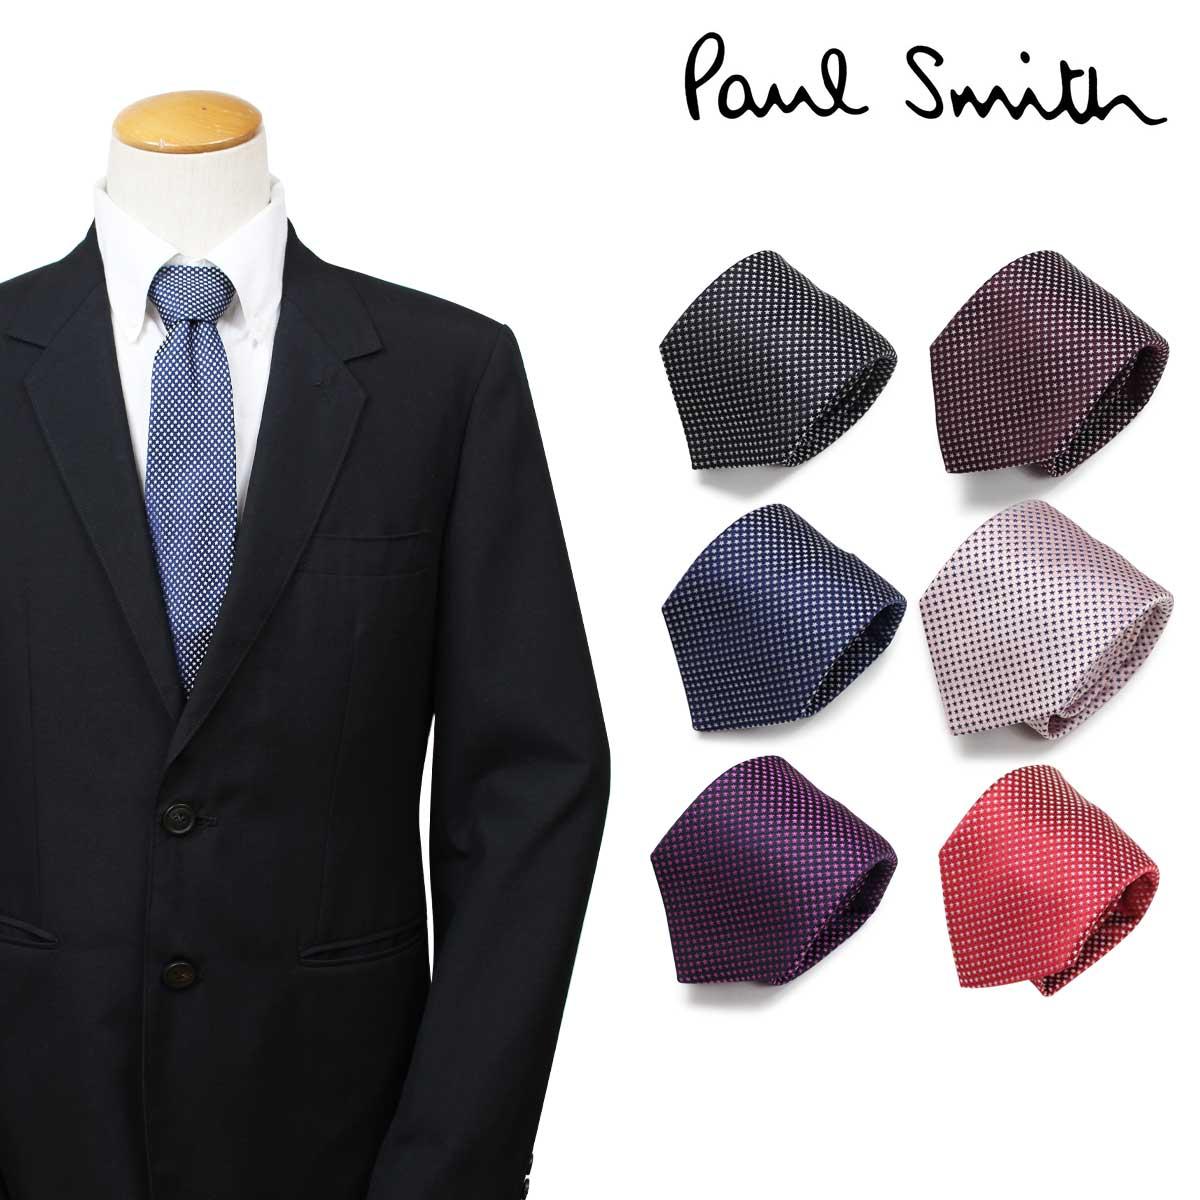 Paul Smith ポールスミス ネクタイ メンズ イタリア製 シルク ビジネス 結婚式 [3/26 追加入荷]